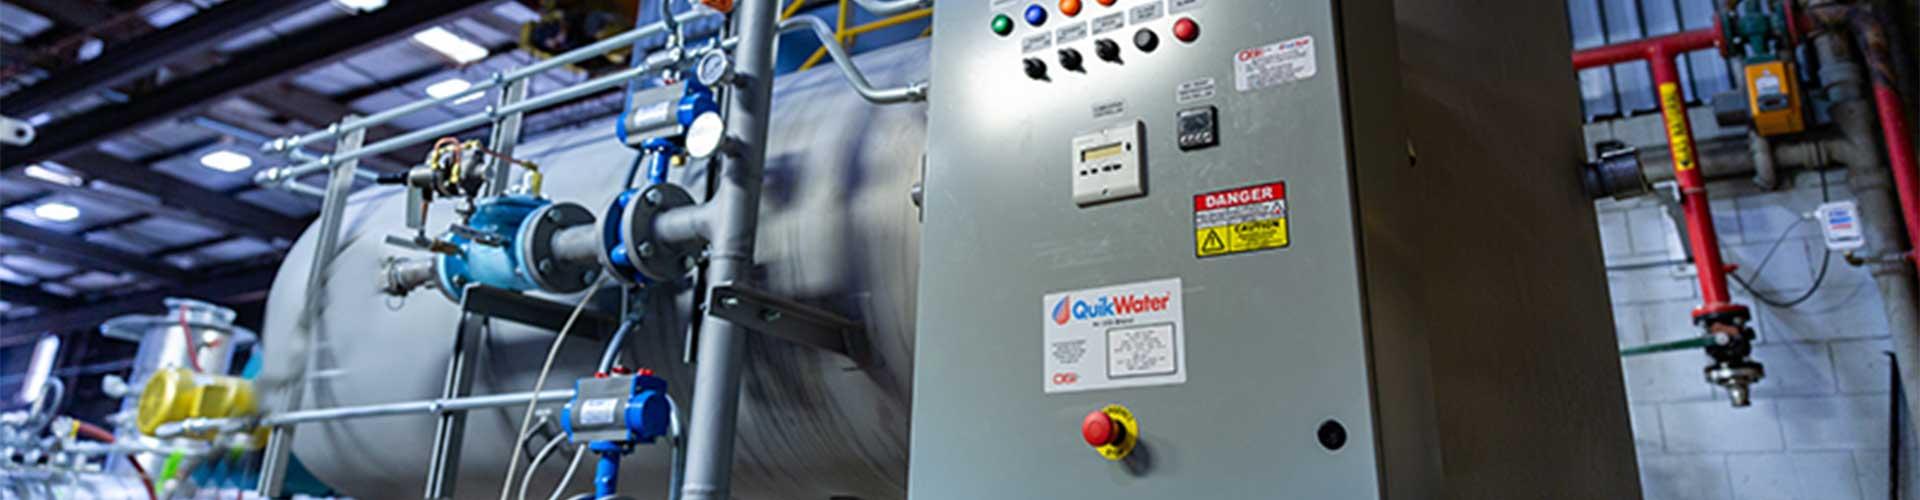 QuikWater Direct Contact Water Heater